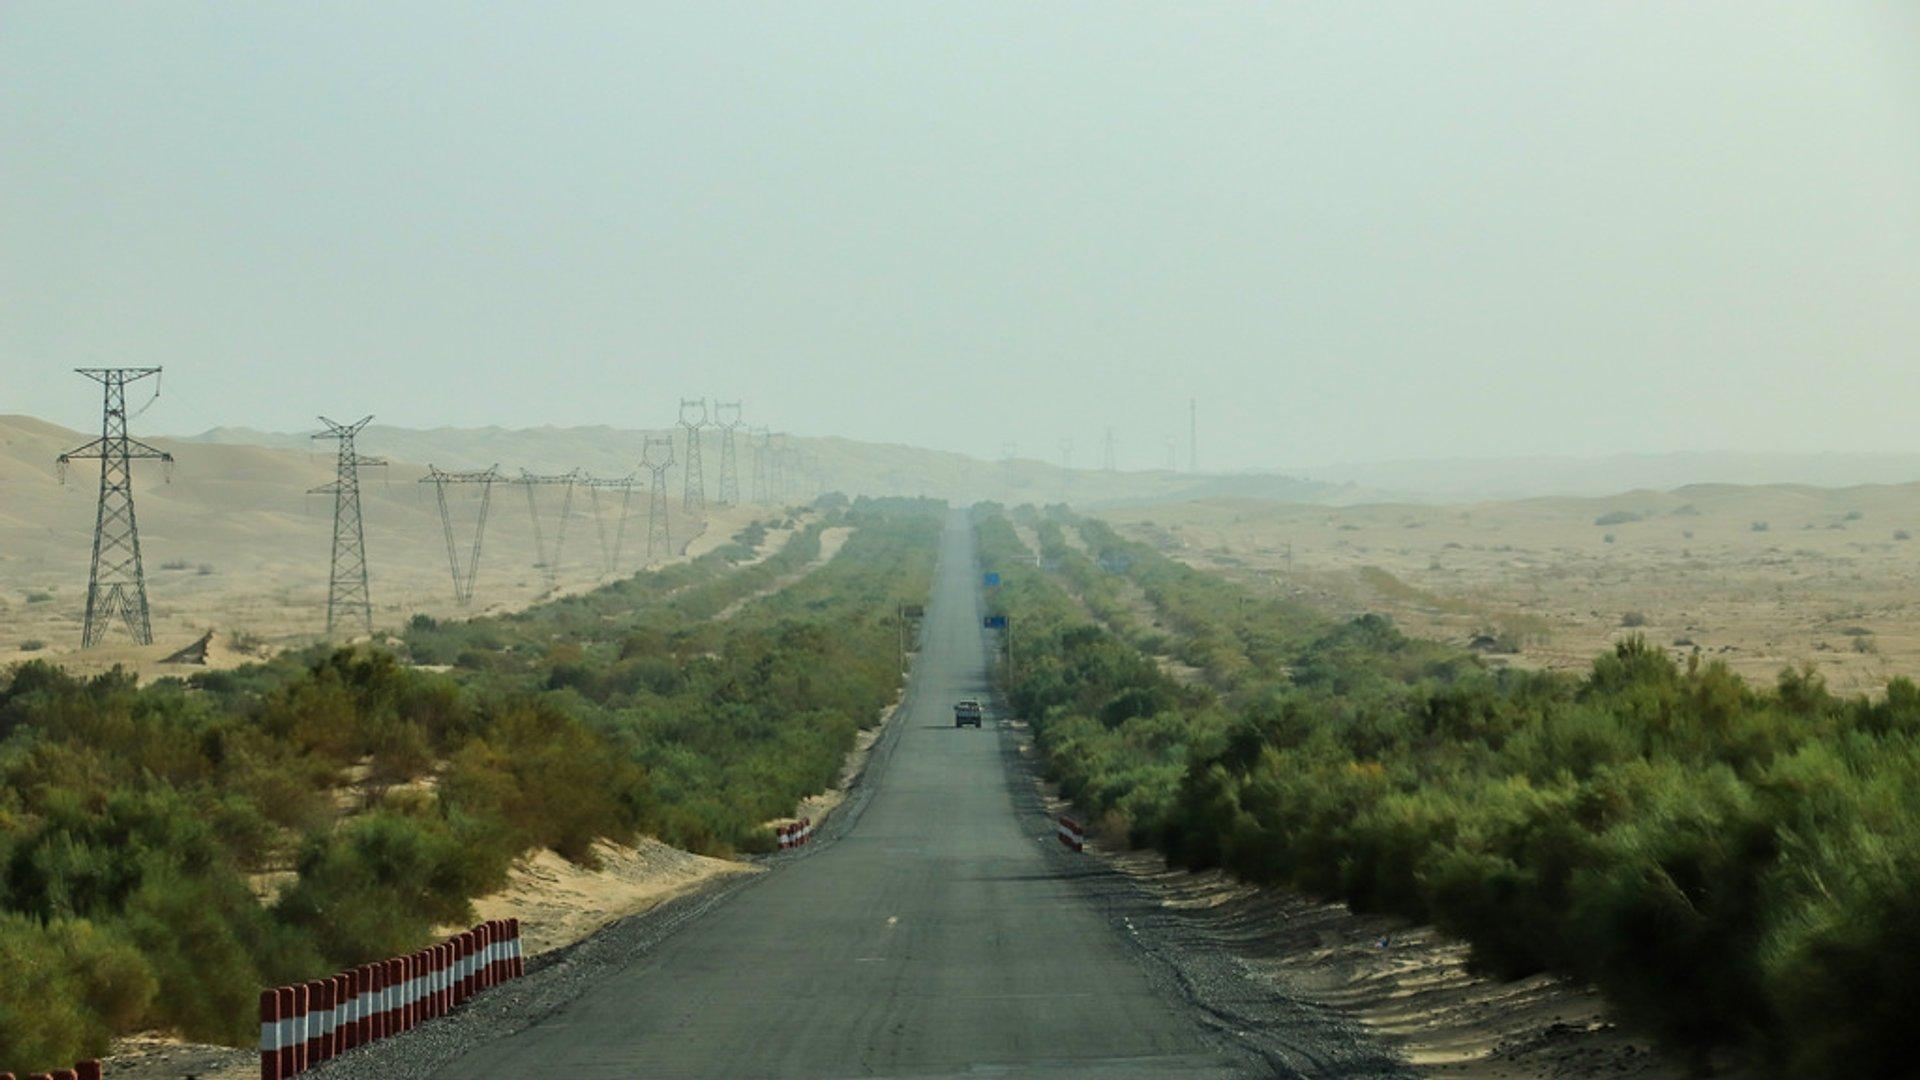 Best time for Tarim Desert Highway in China 2020